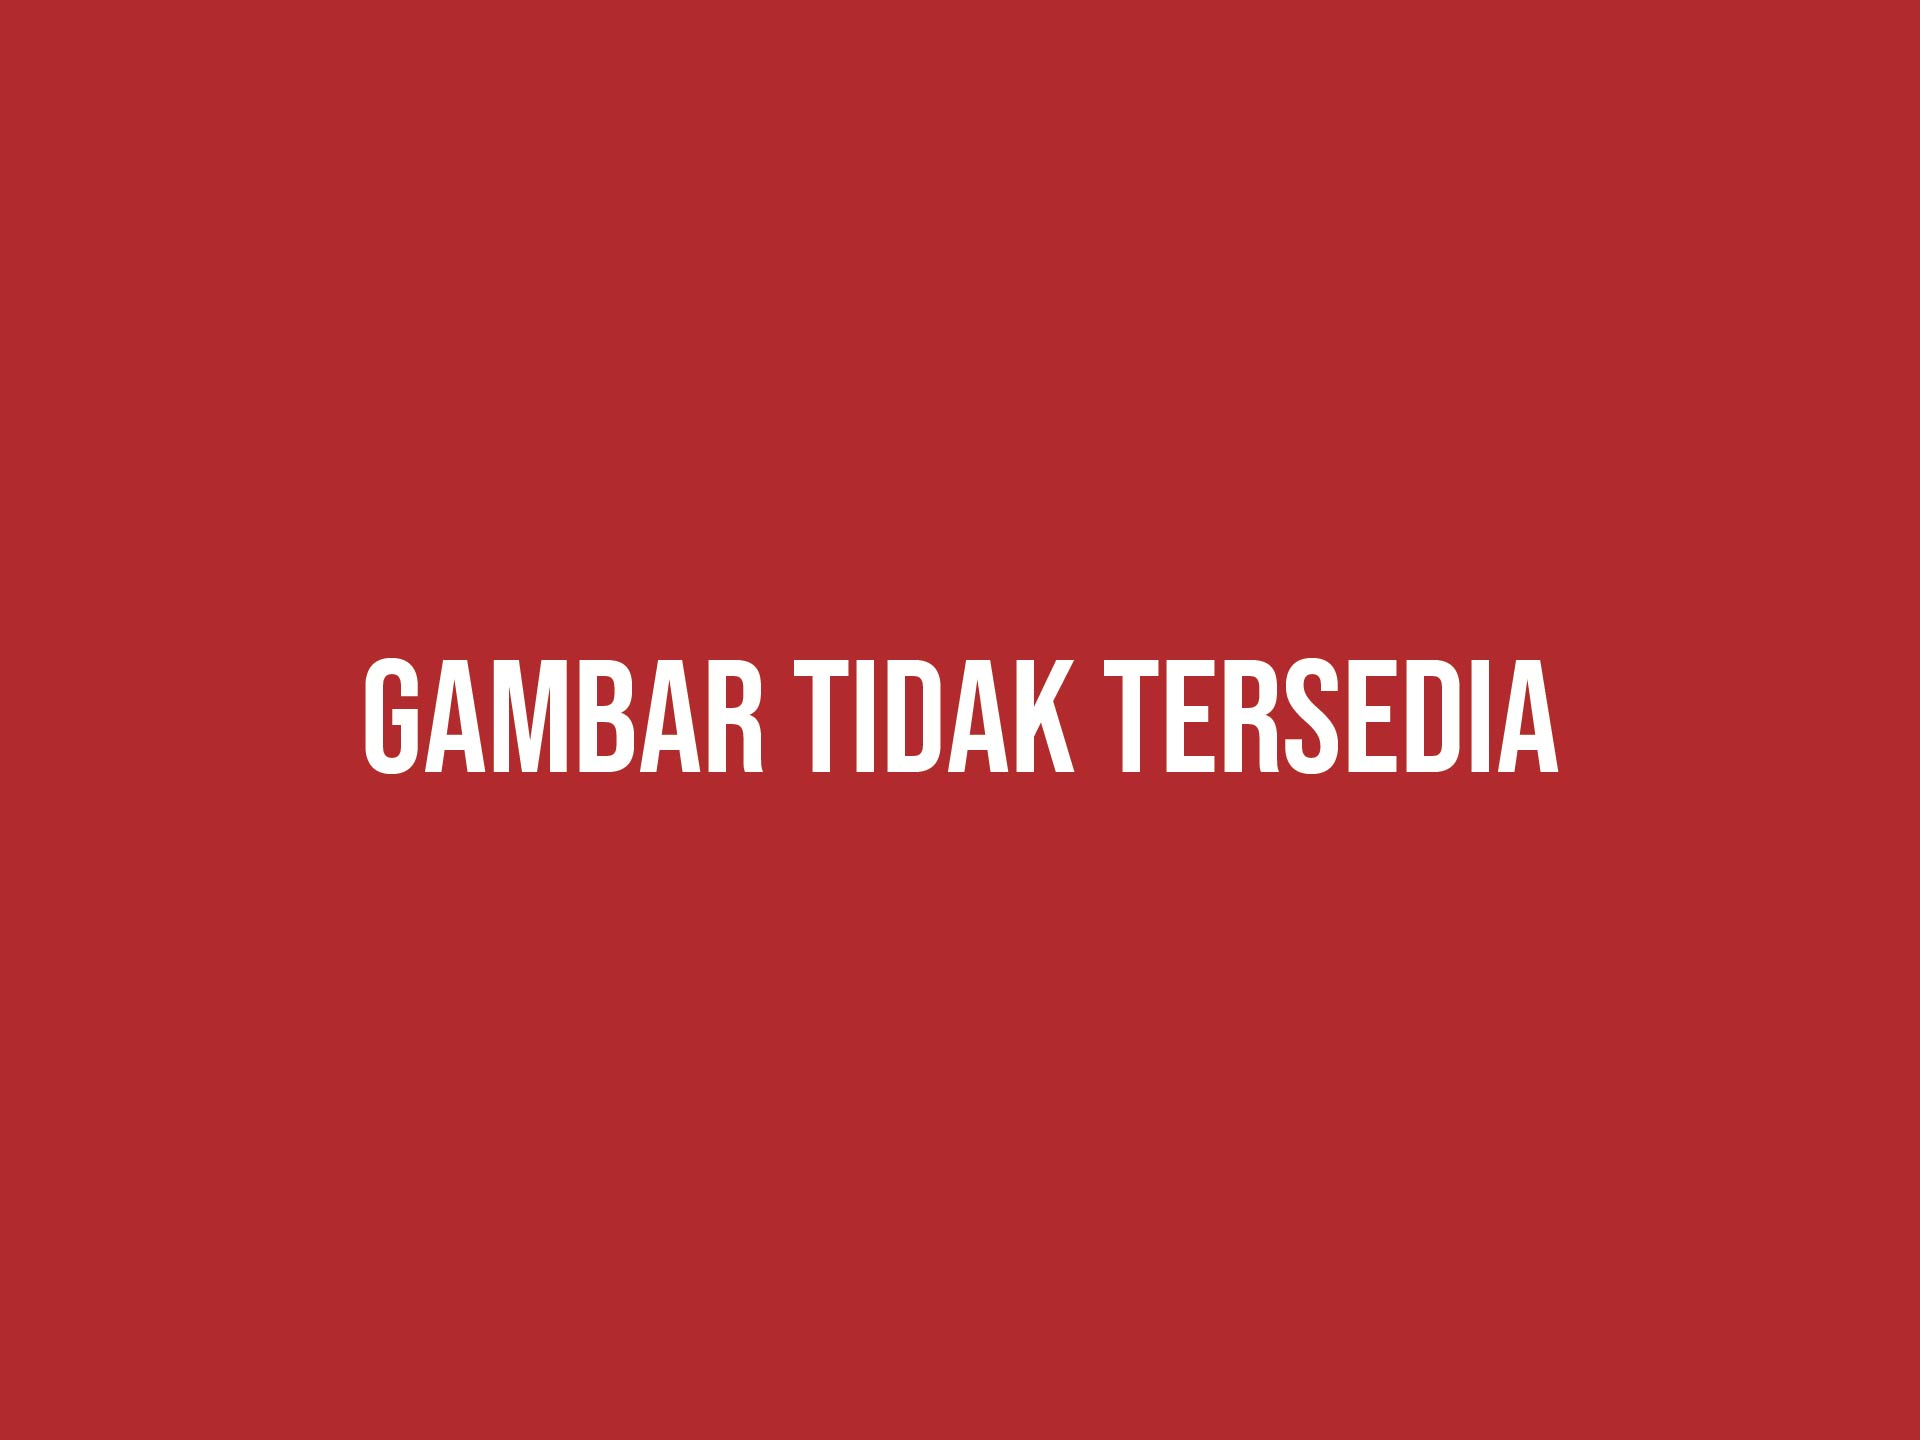 Tabona Muara Karang